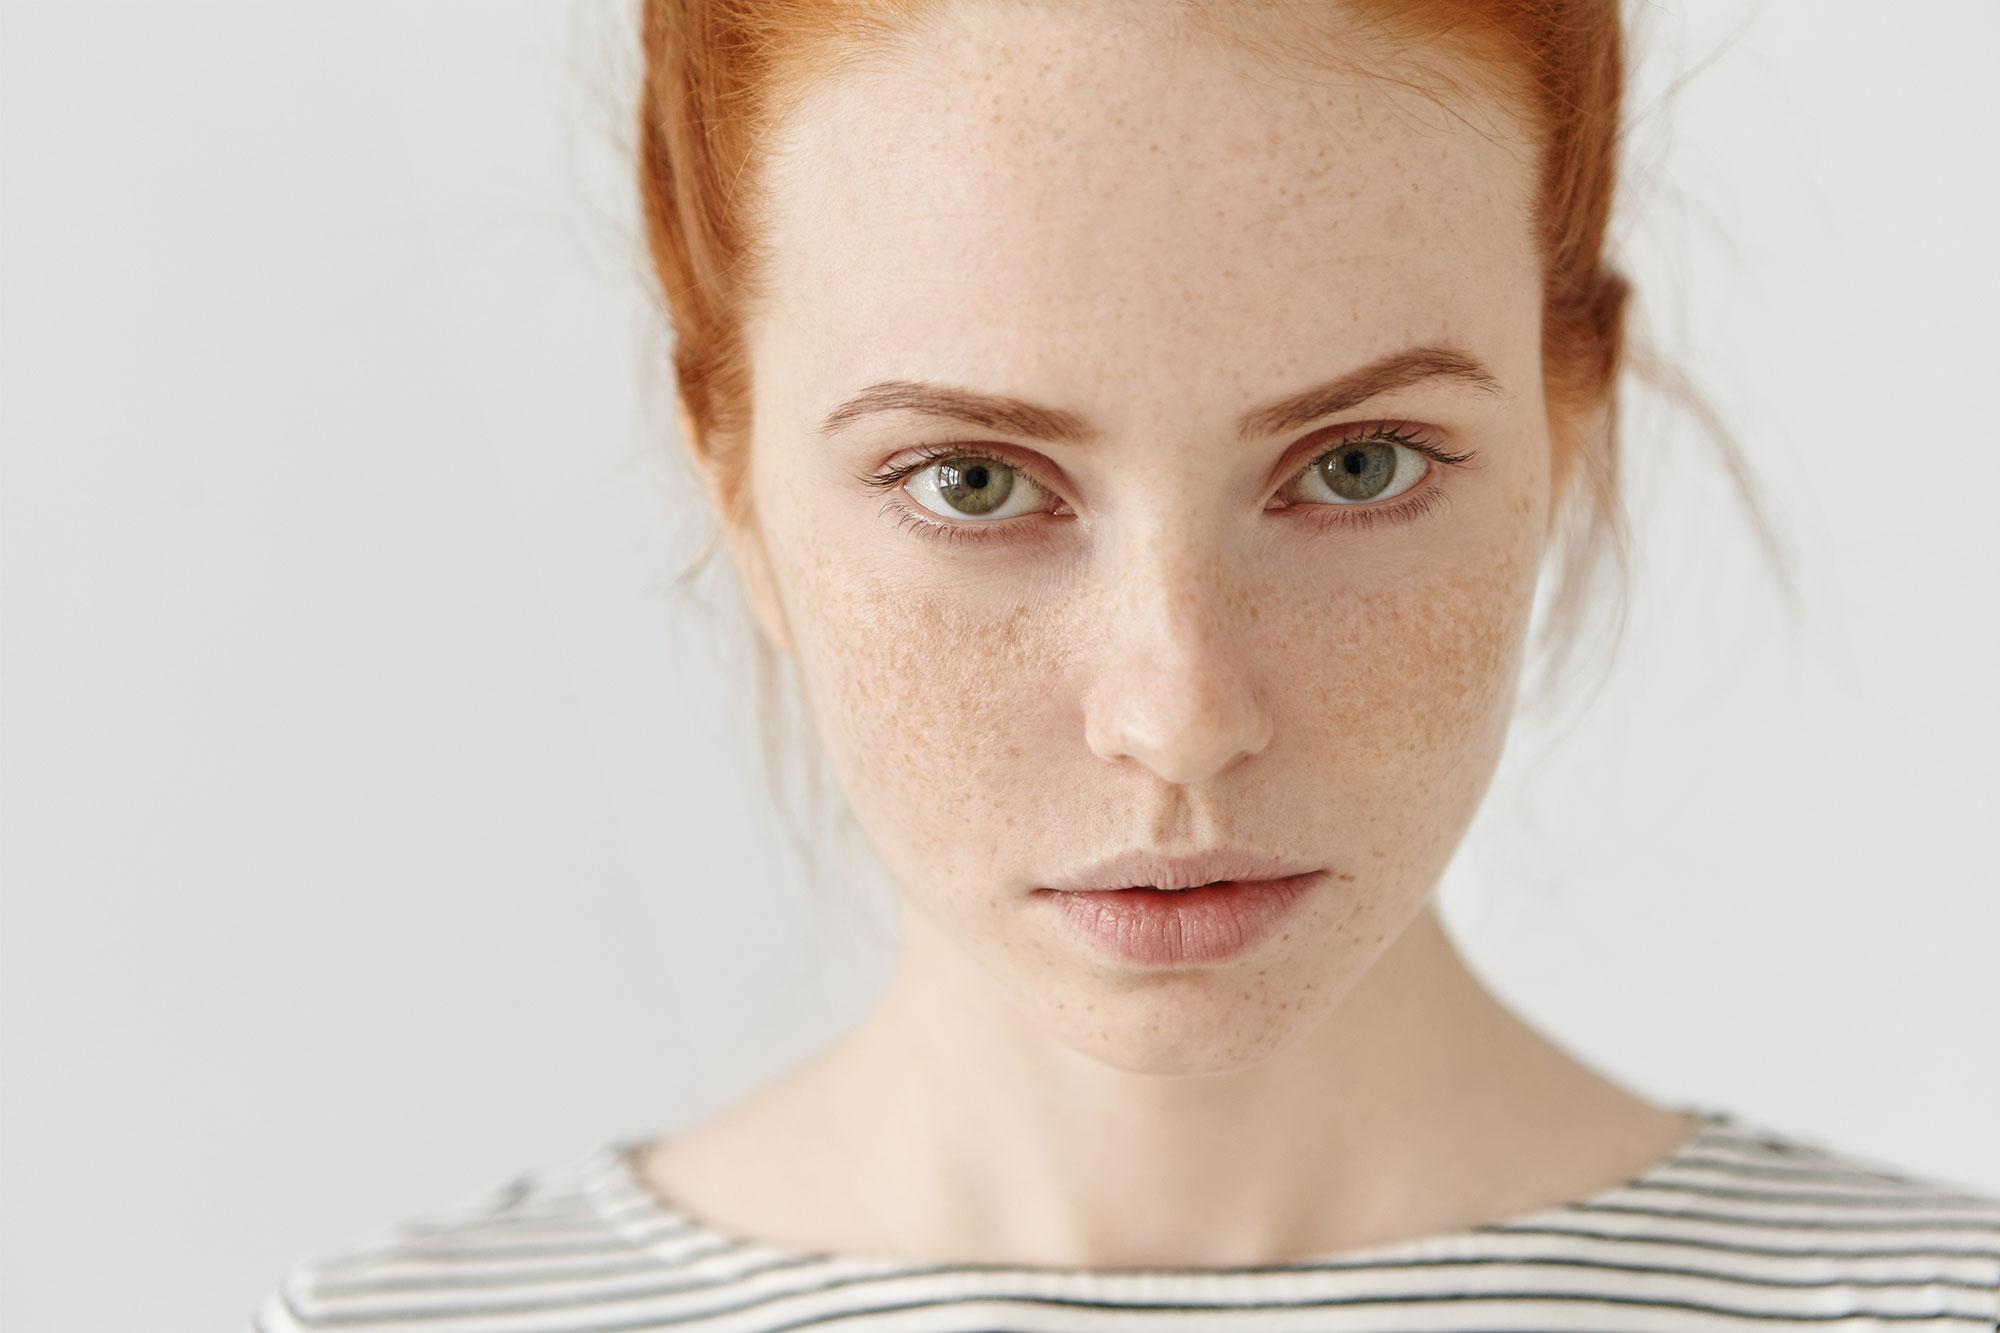 very pale skin type